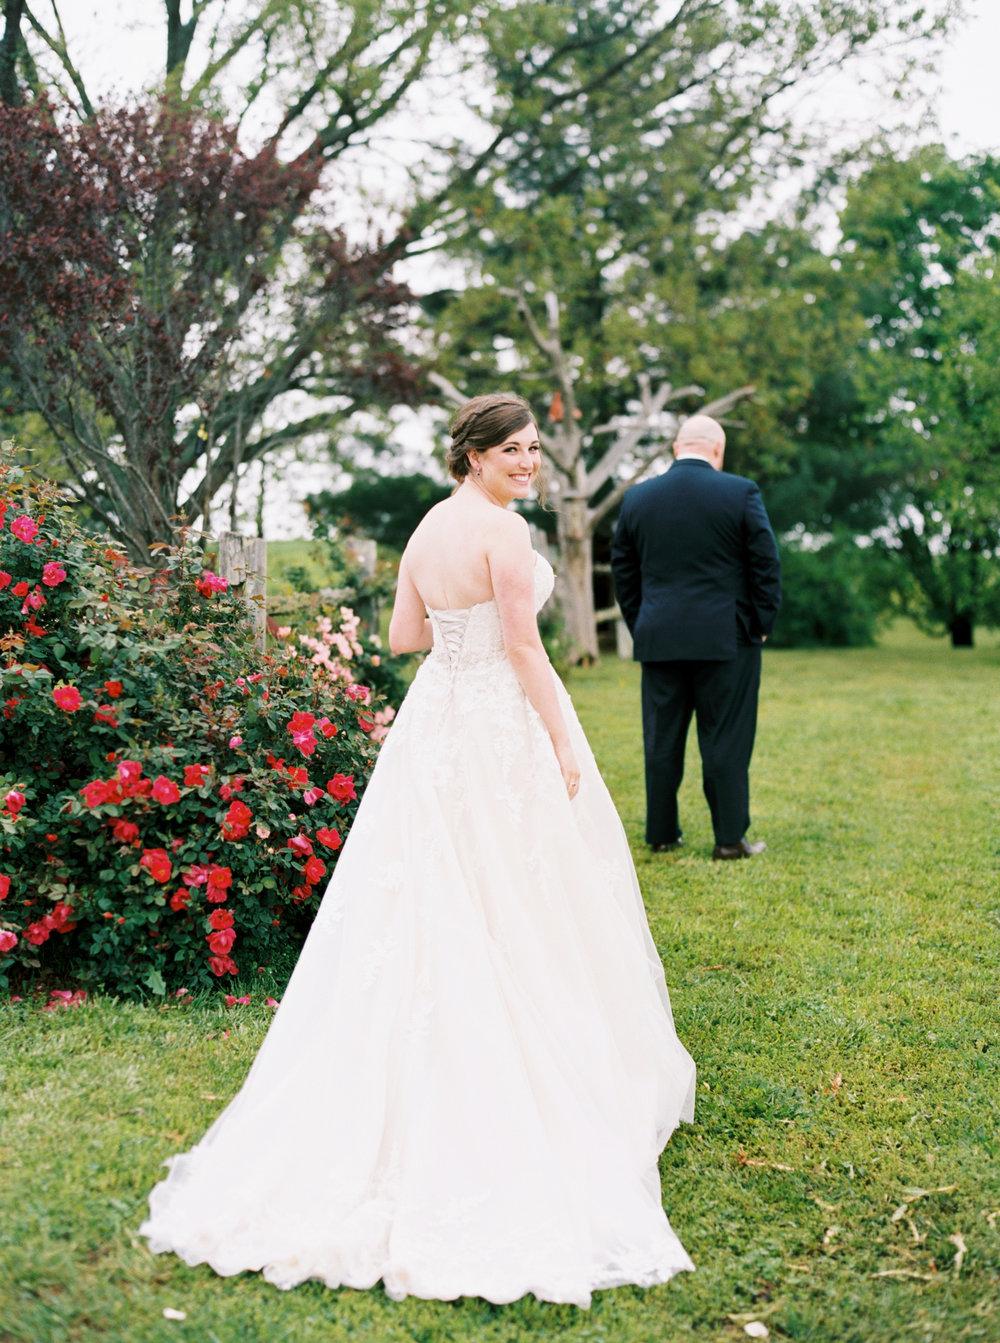 Lydia_johnathan_Wedding_Abigail_Malone_Photography-171.jpg